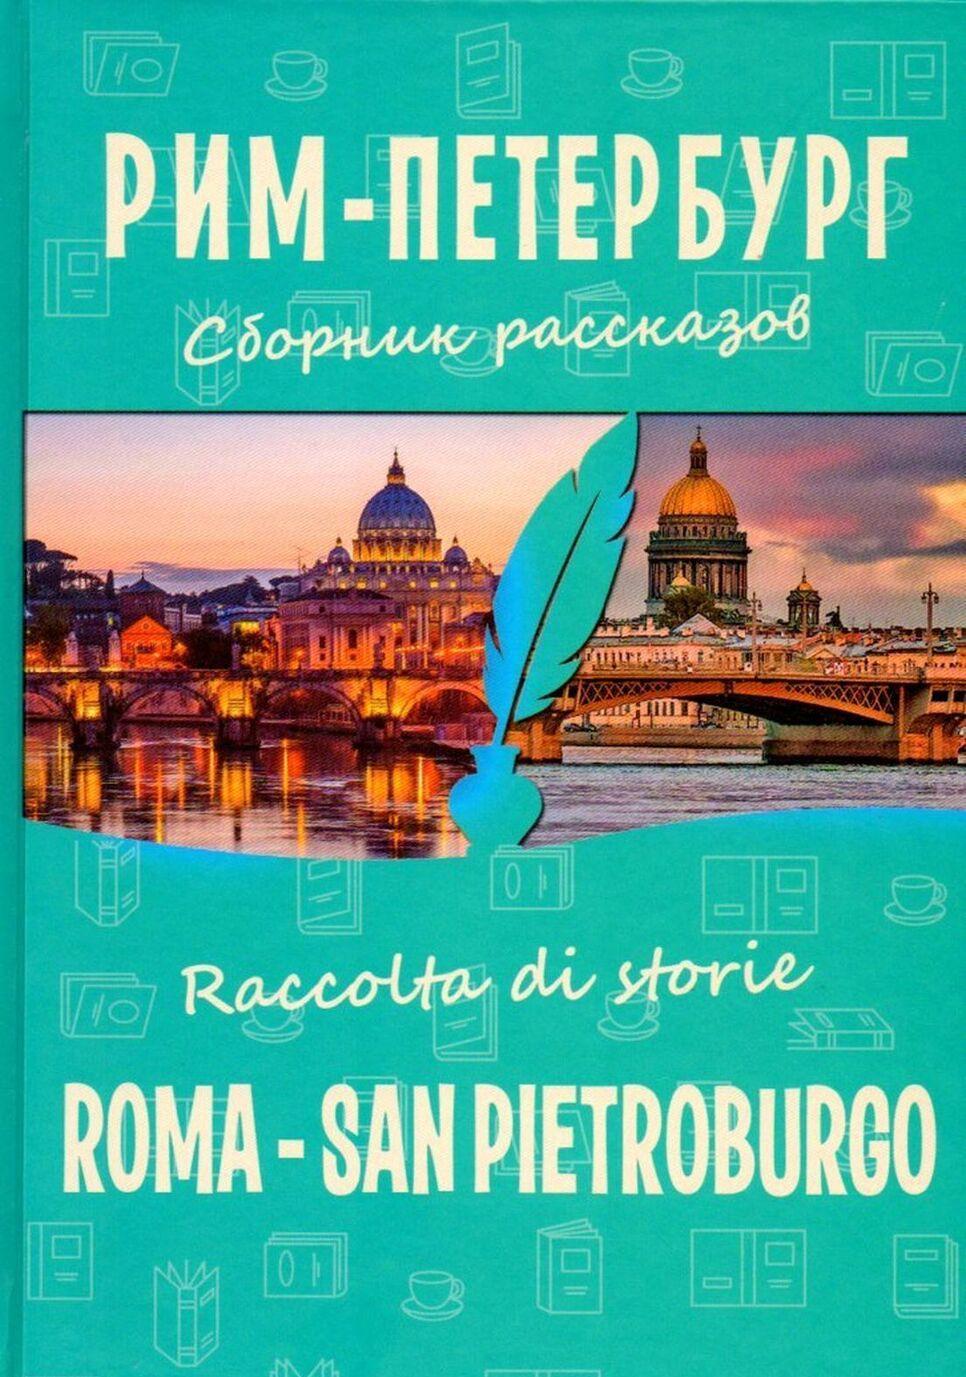 Rim - Peterburg. Sbornik rasskazov / Roma - San Pietroburgo. Raccolta di storie